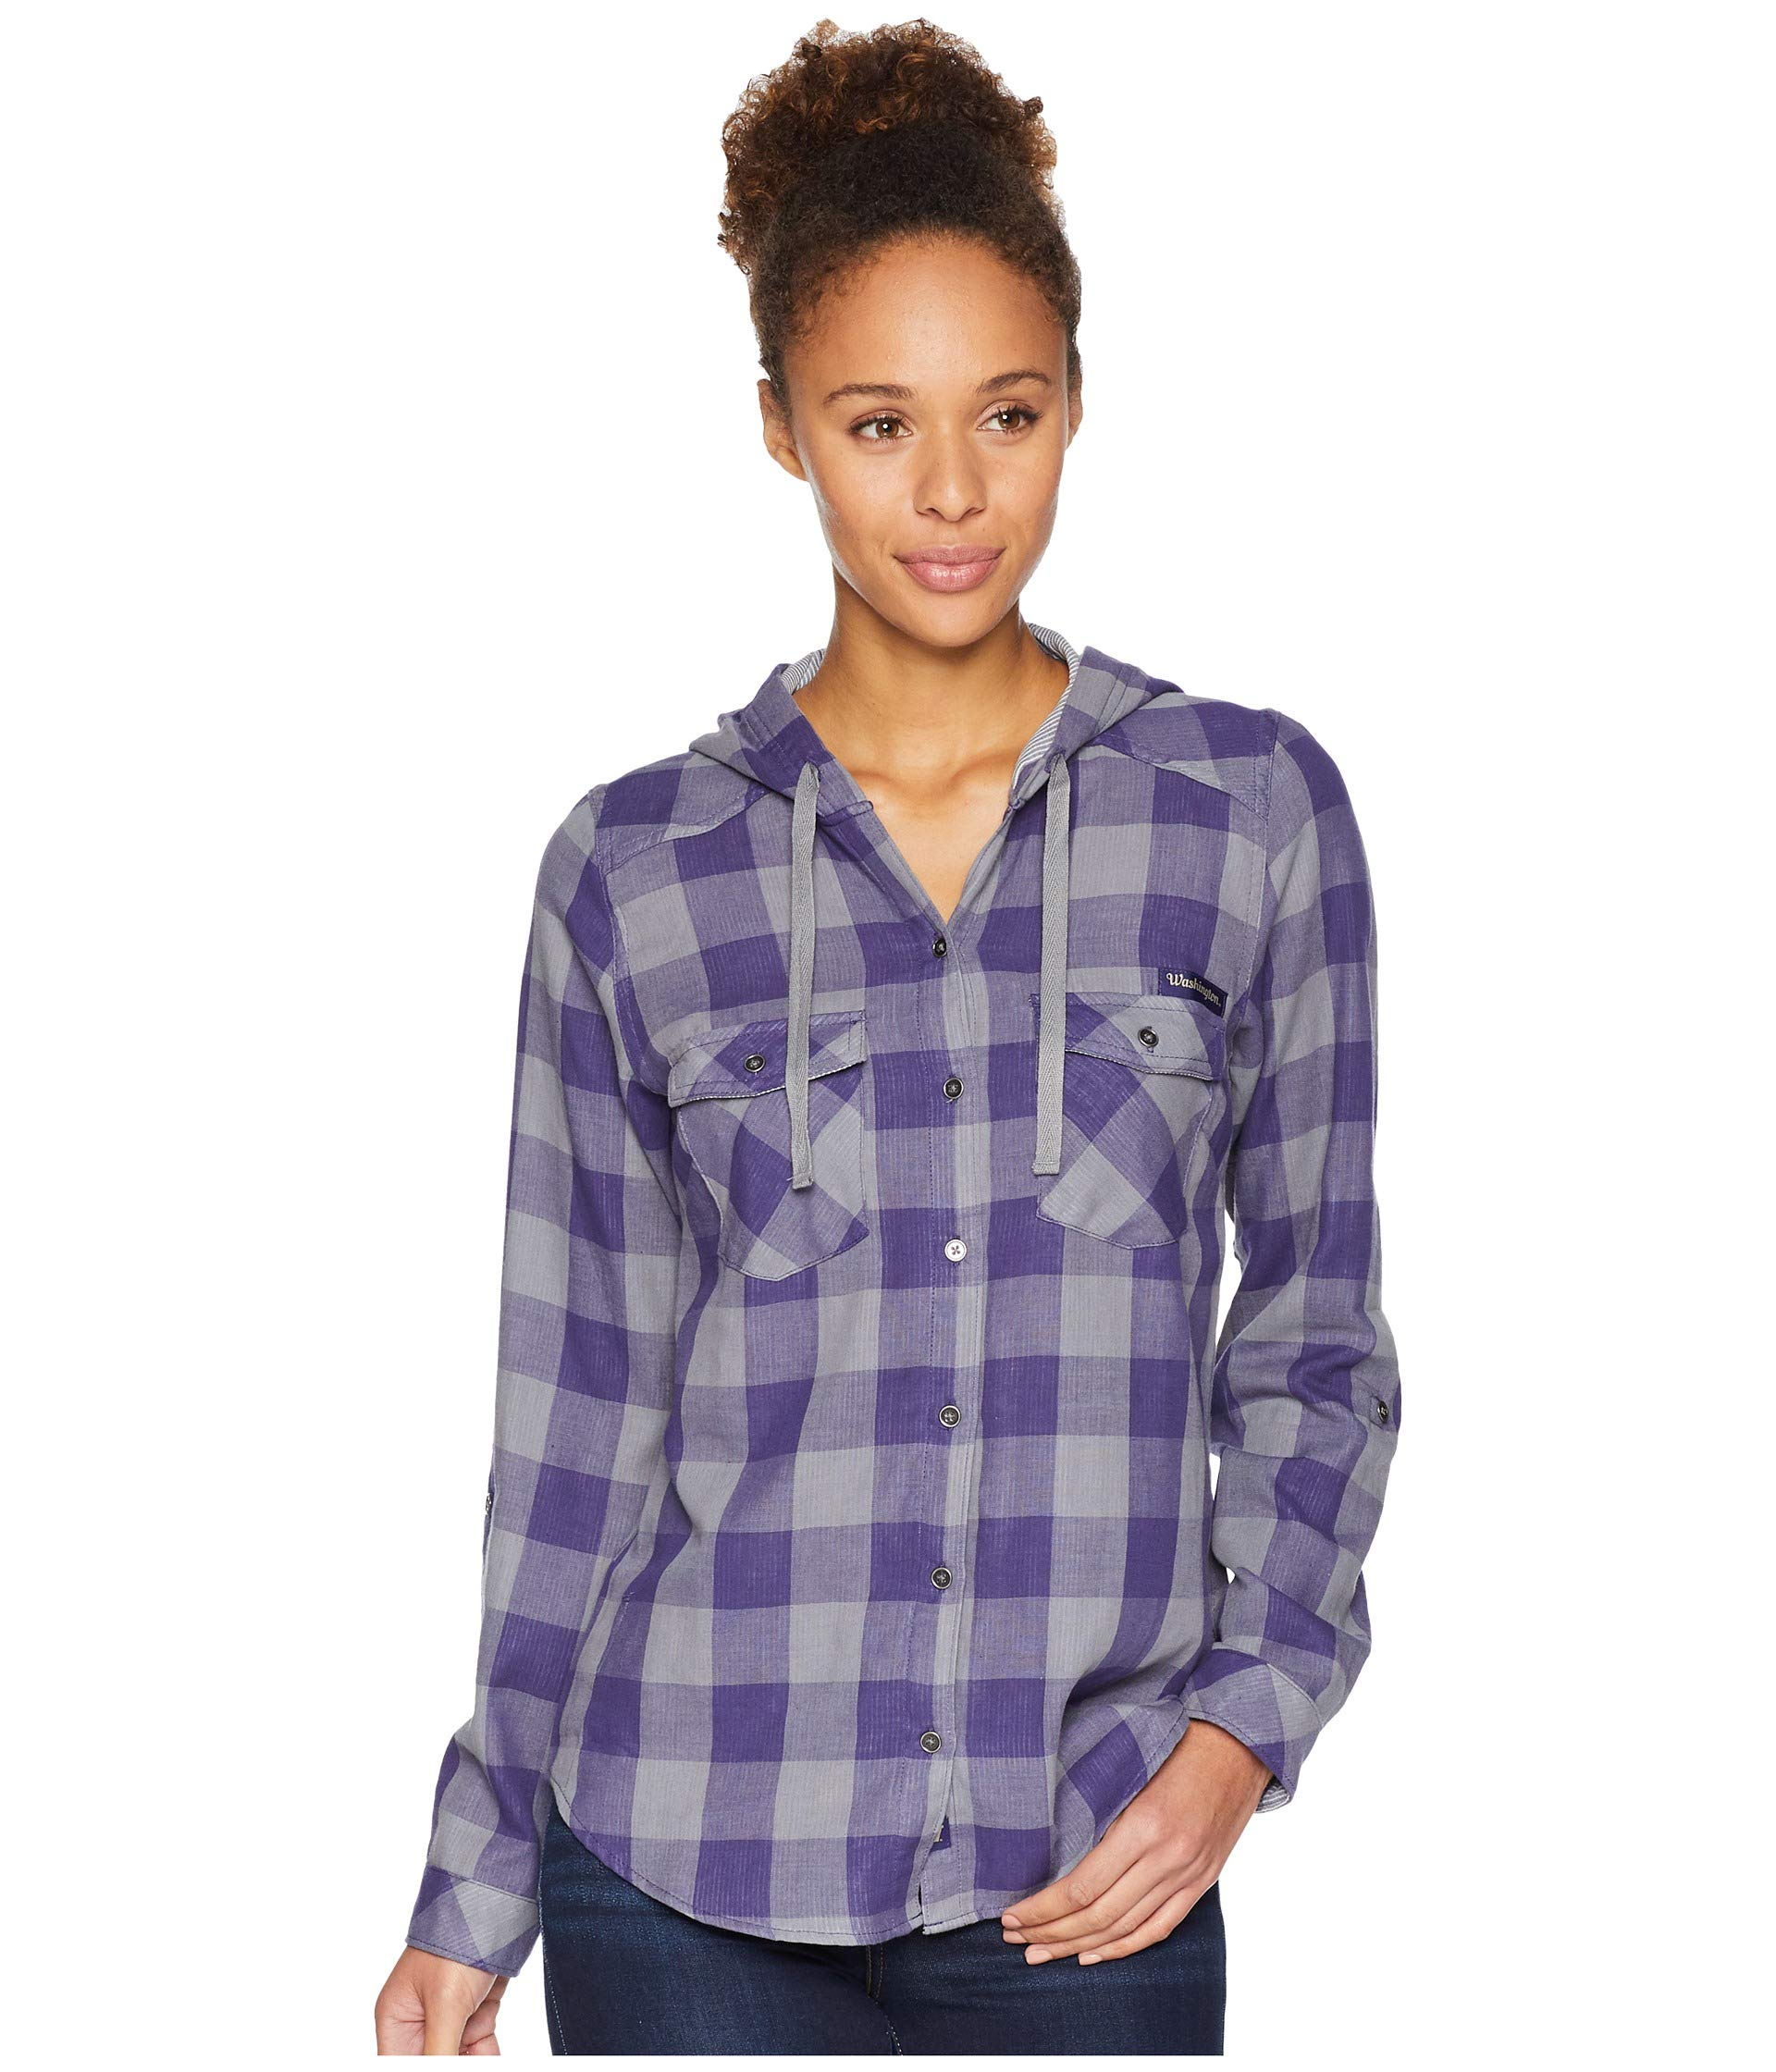 Times deep Collegiate Columbia Shirt Sleeve Check Hooded Purple Uw Long Two™ T5xwp